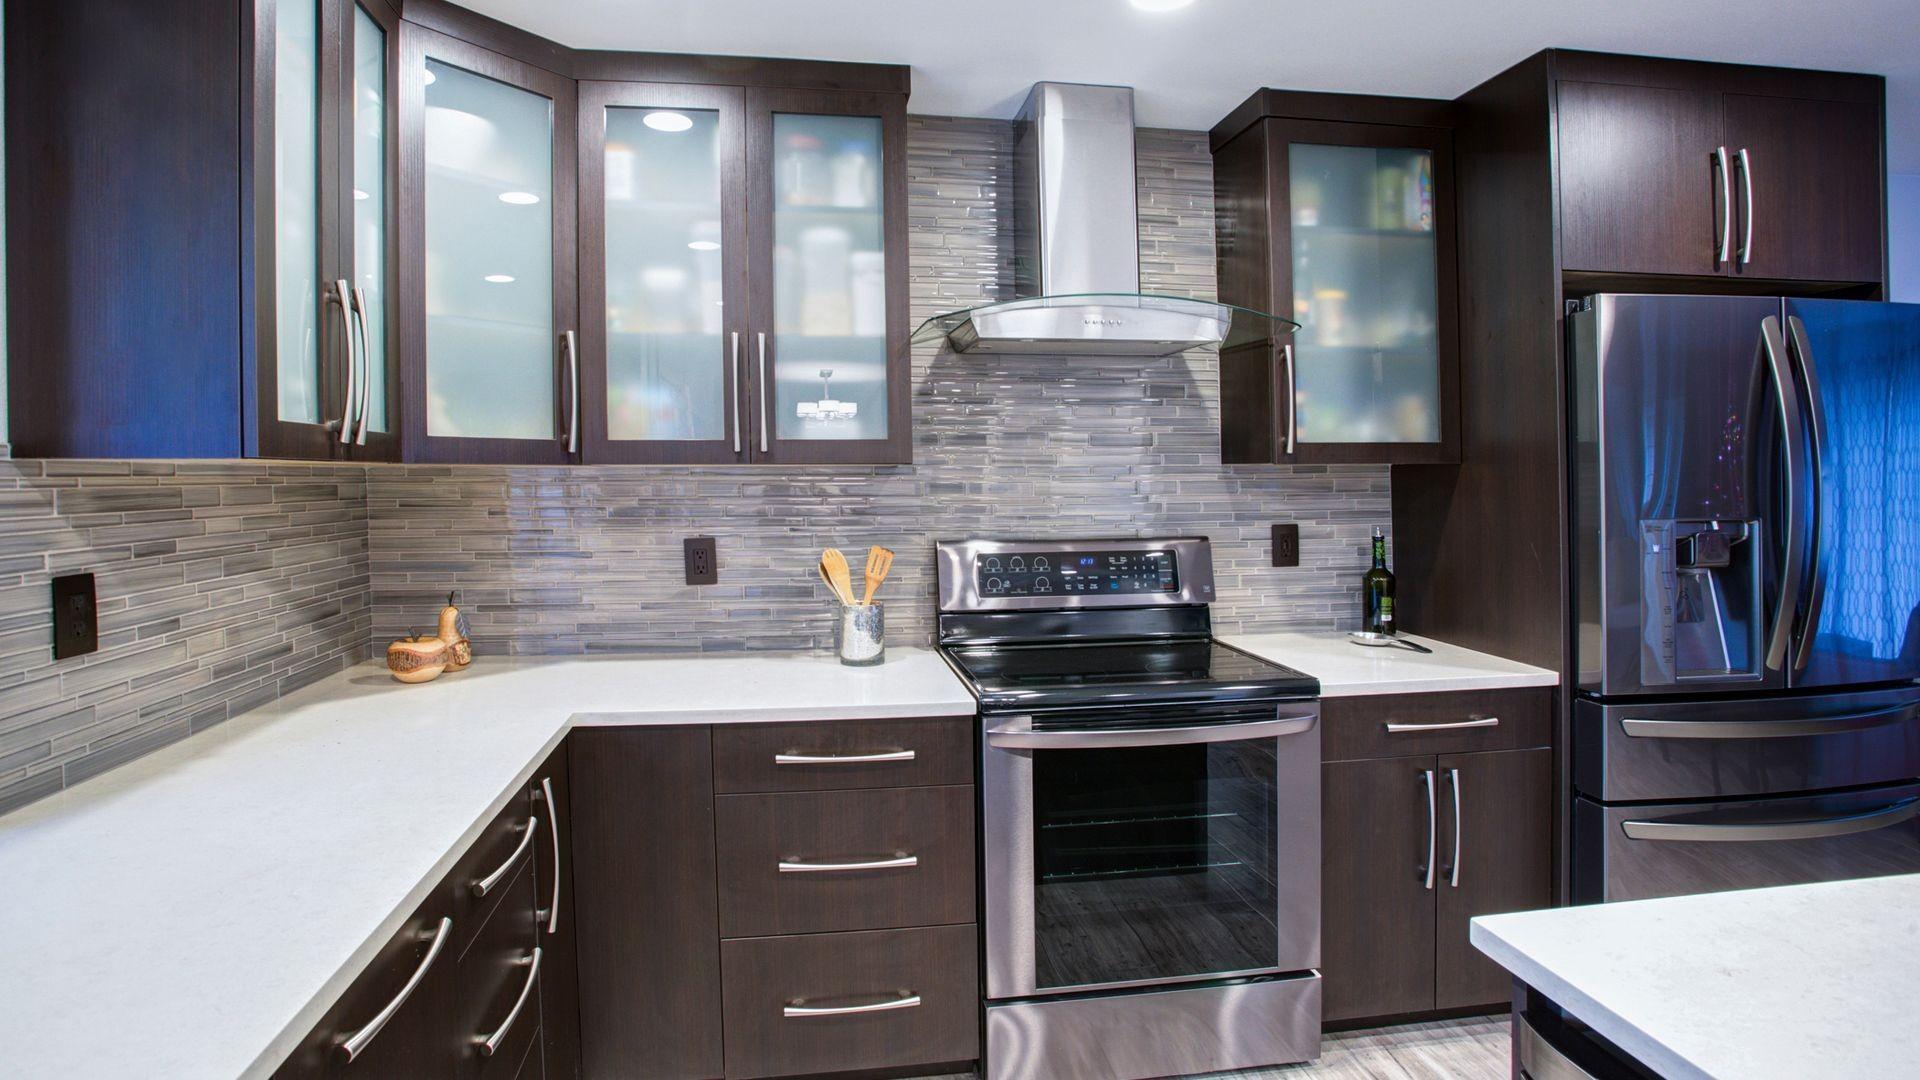 Muebles de cocina a medida en Guipúzcoa